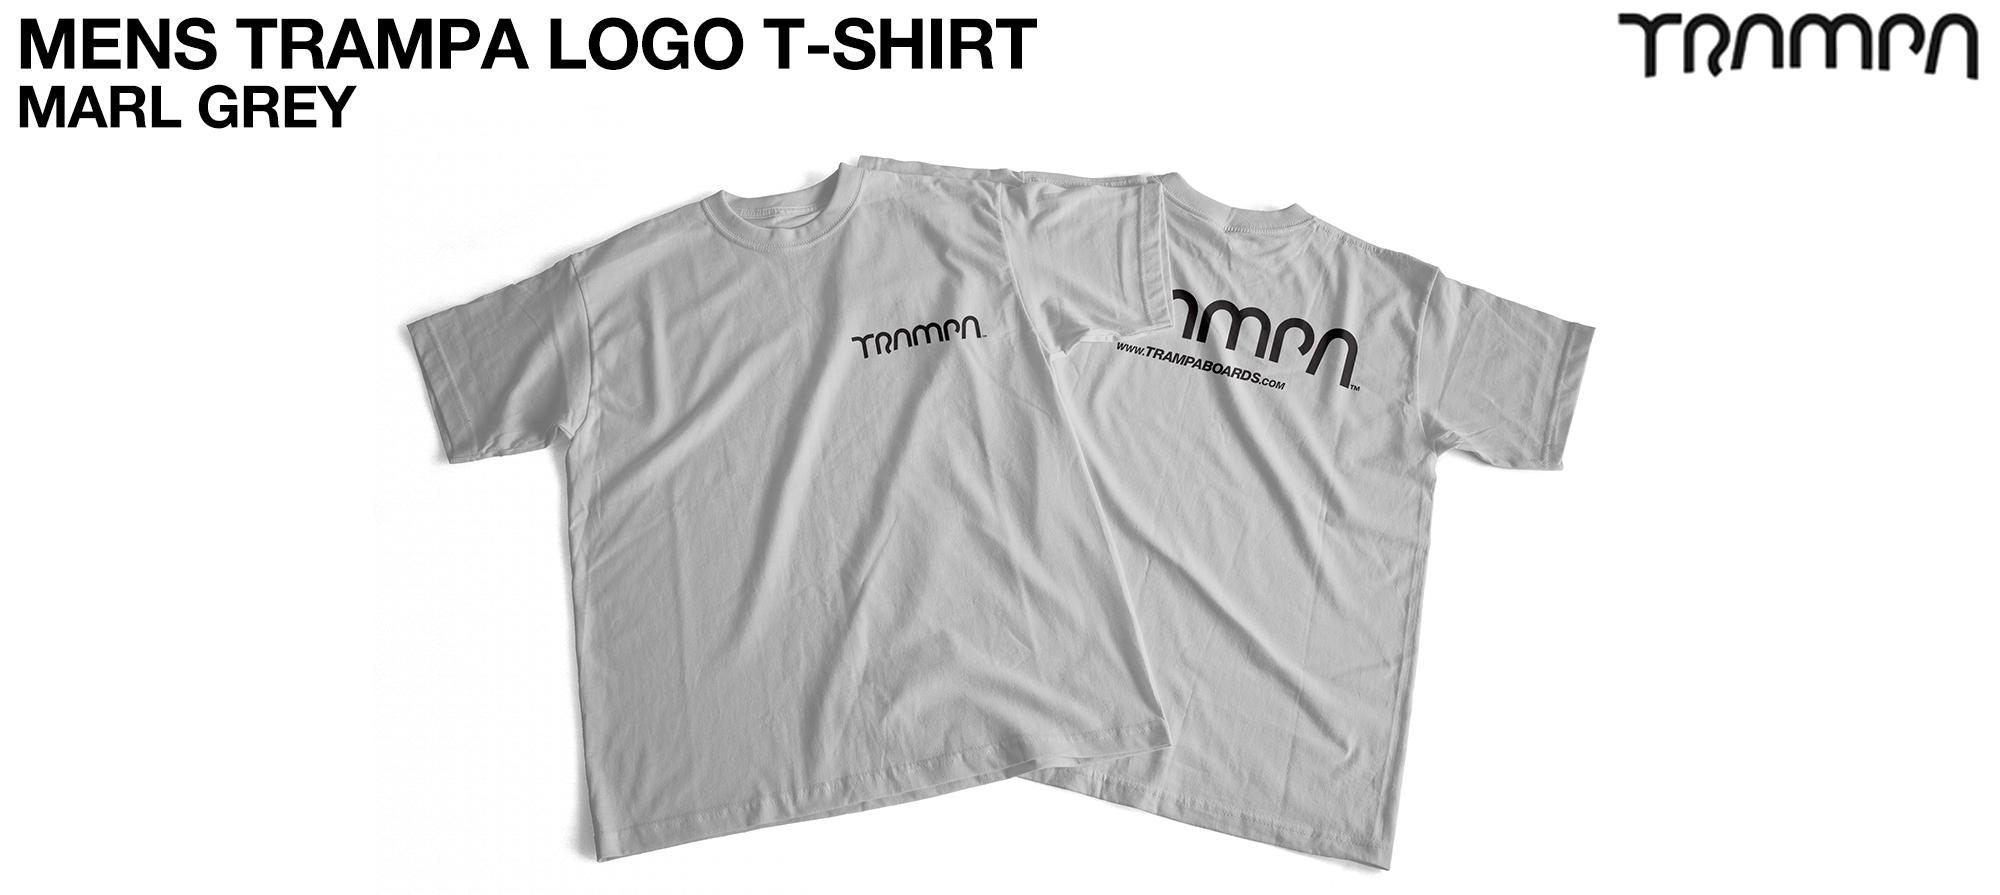 Gildan T Shirt Marl Grey with Black Logo